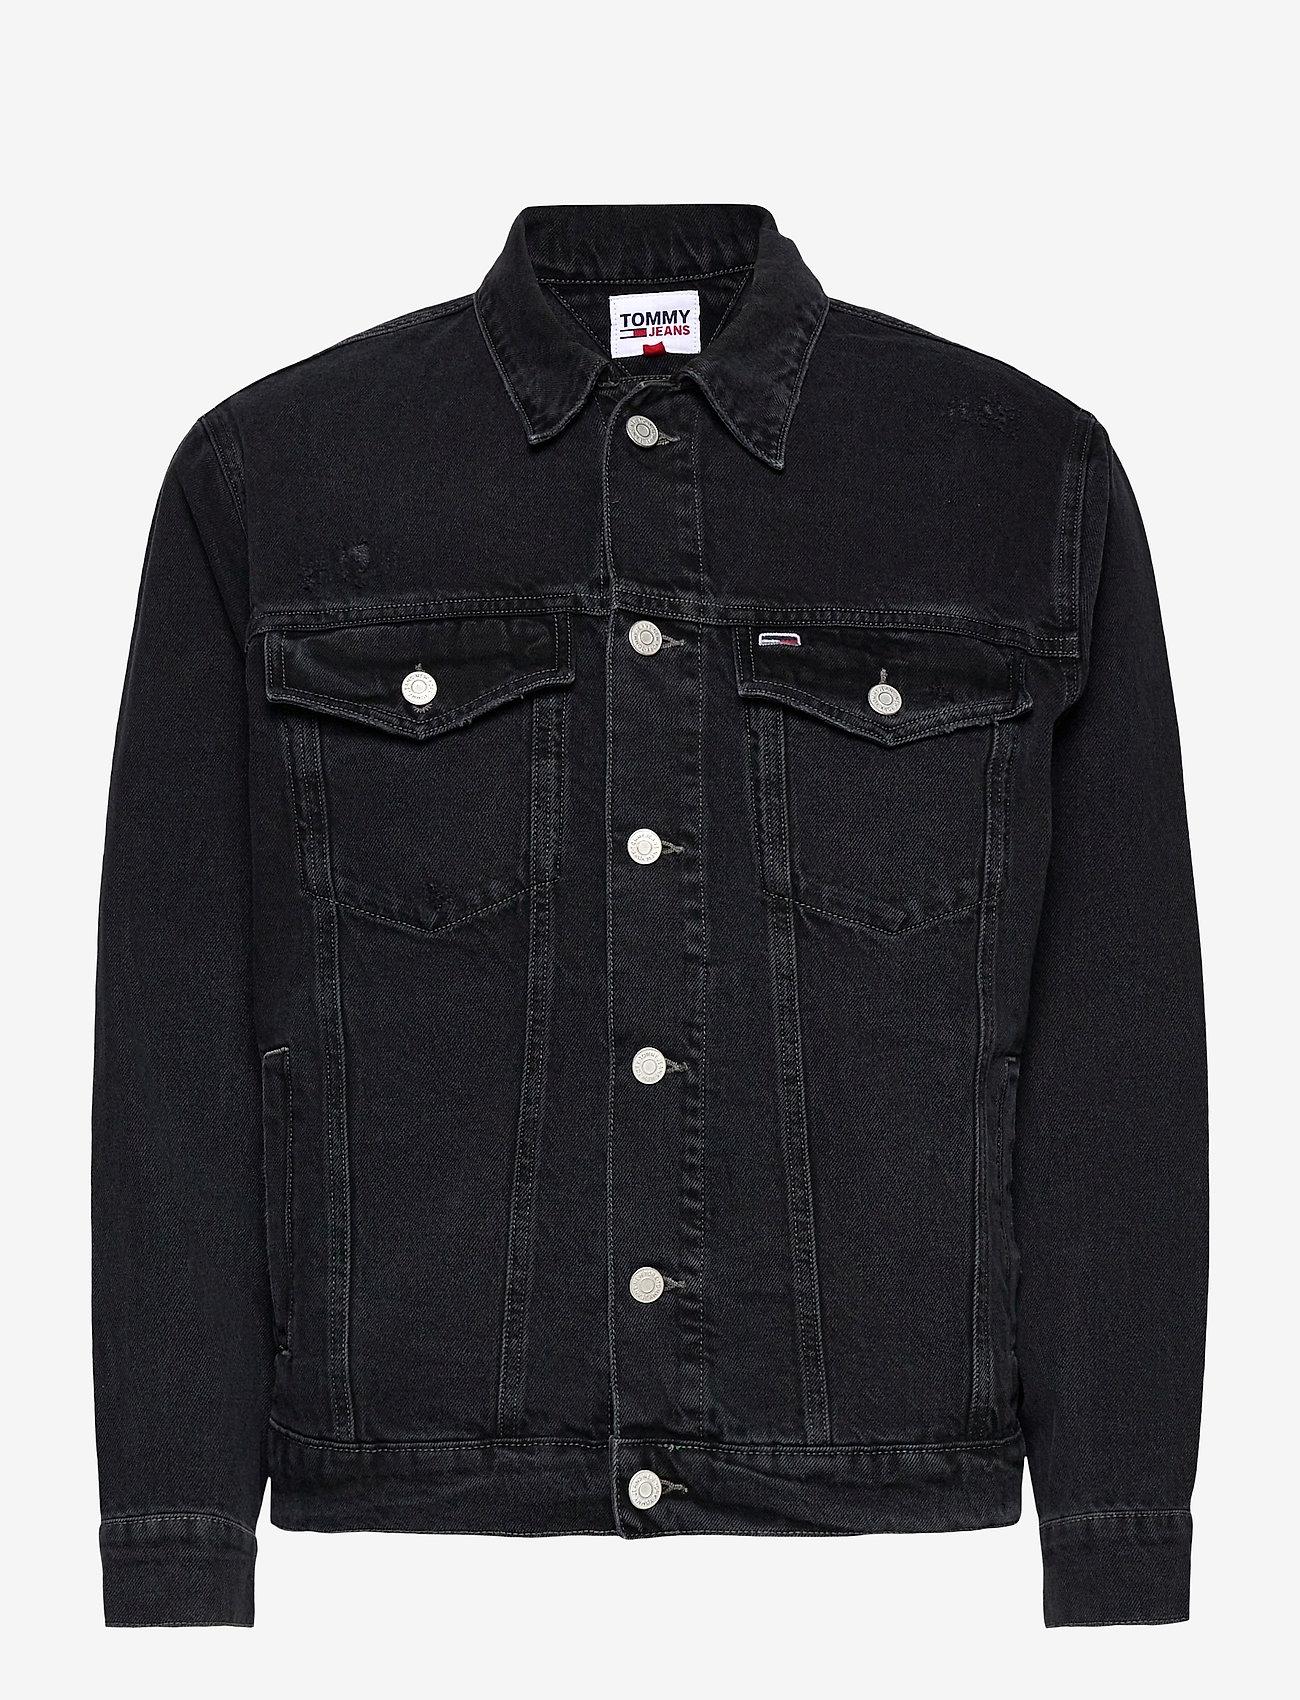 Tommy Jeans - OVERSIZE TRUCKER JACKET SSPBBRD - jeansjackor - save sp bk bk rgd destr - 0